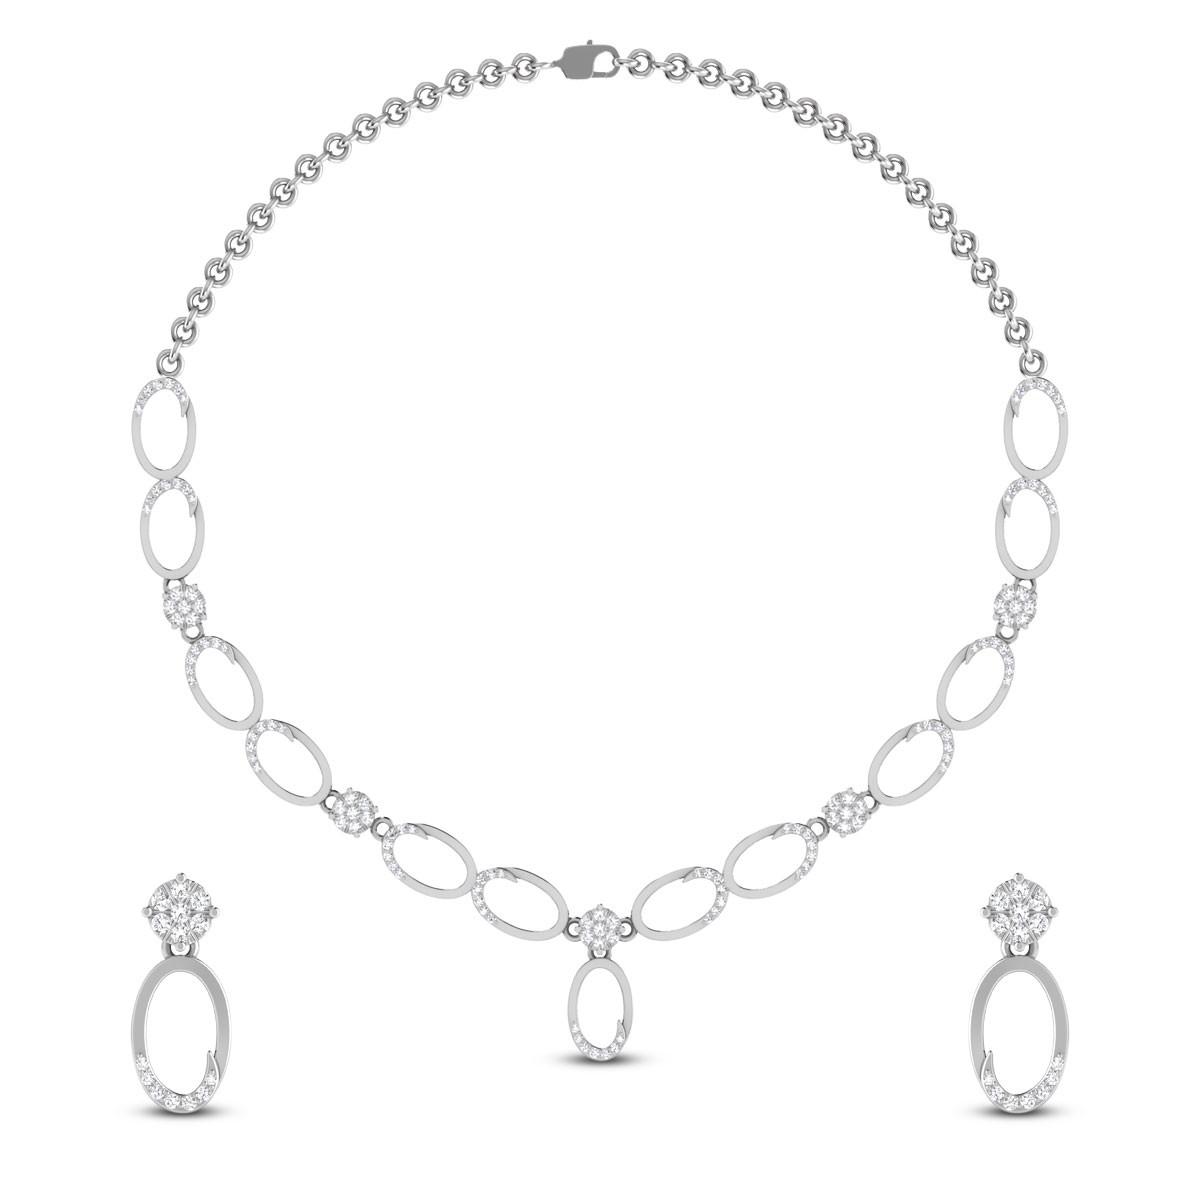 Bakula Diamond Necklace Set